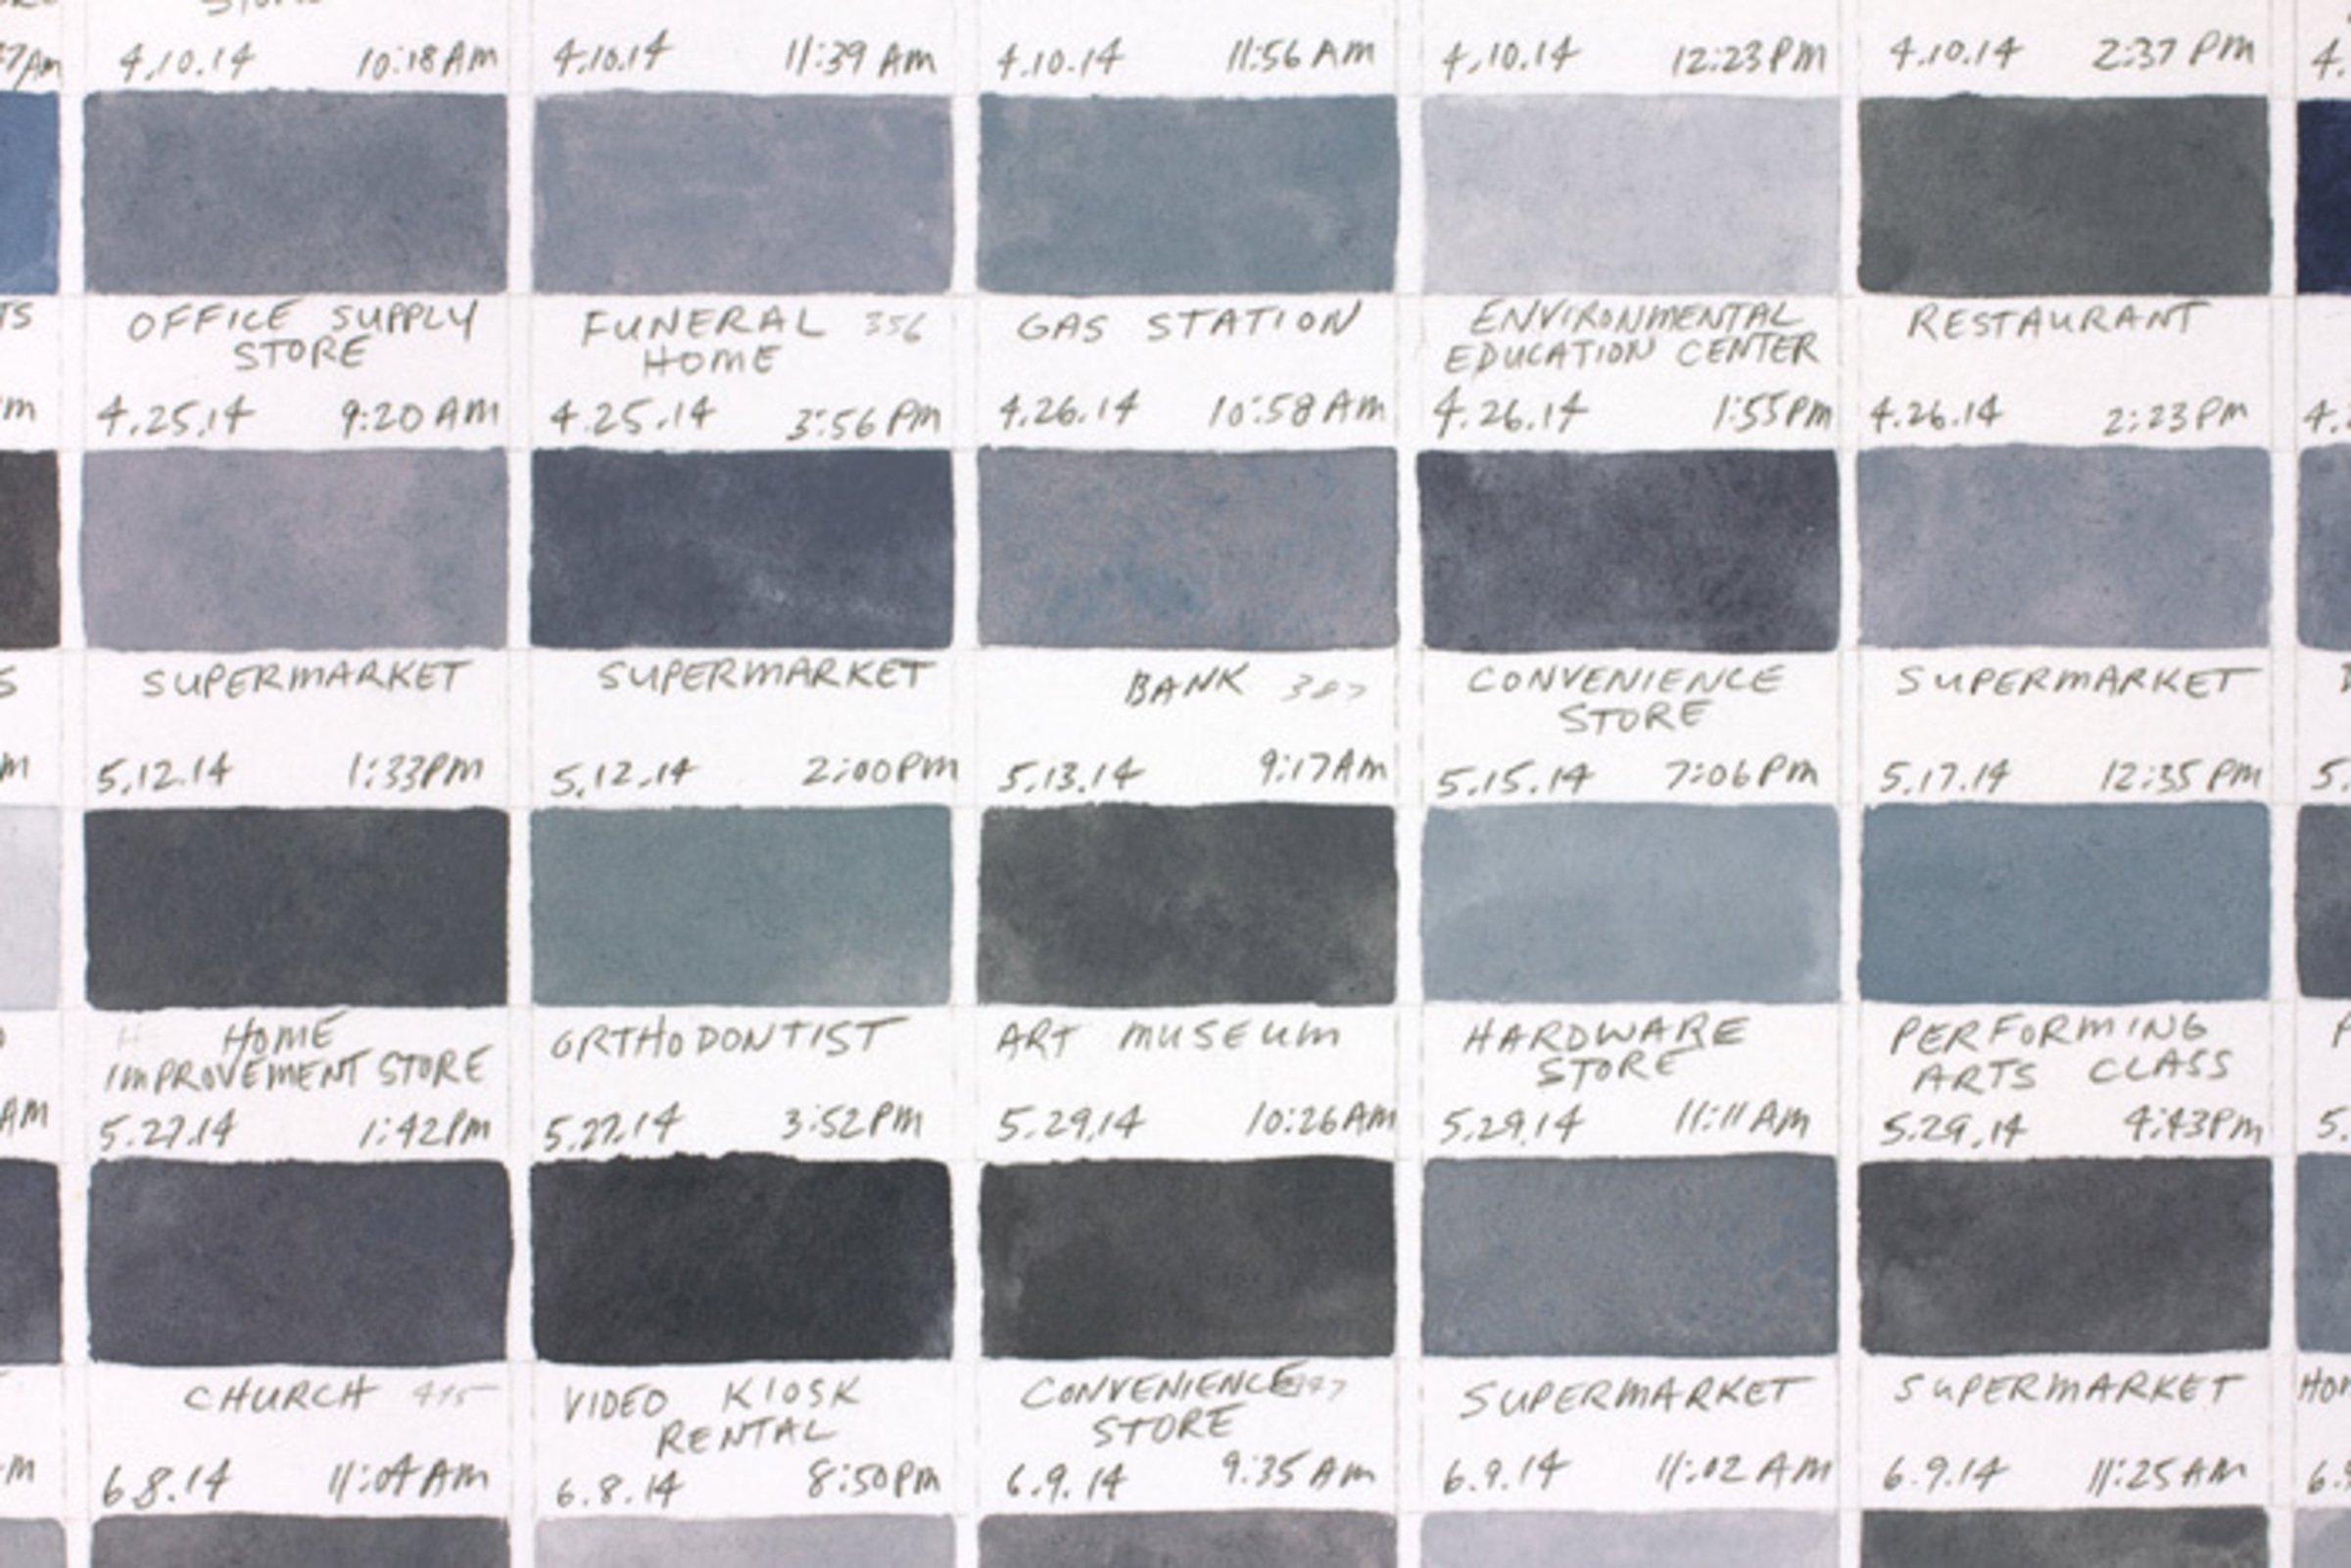 Richard Garrison, Parking Space Color Scheme (January 2 -September 26, 2014), 2015-2016